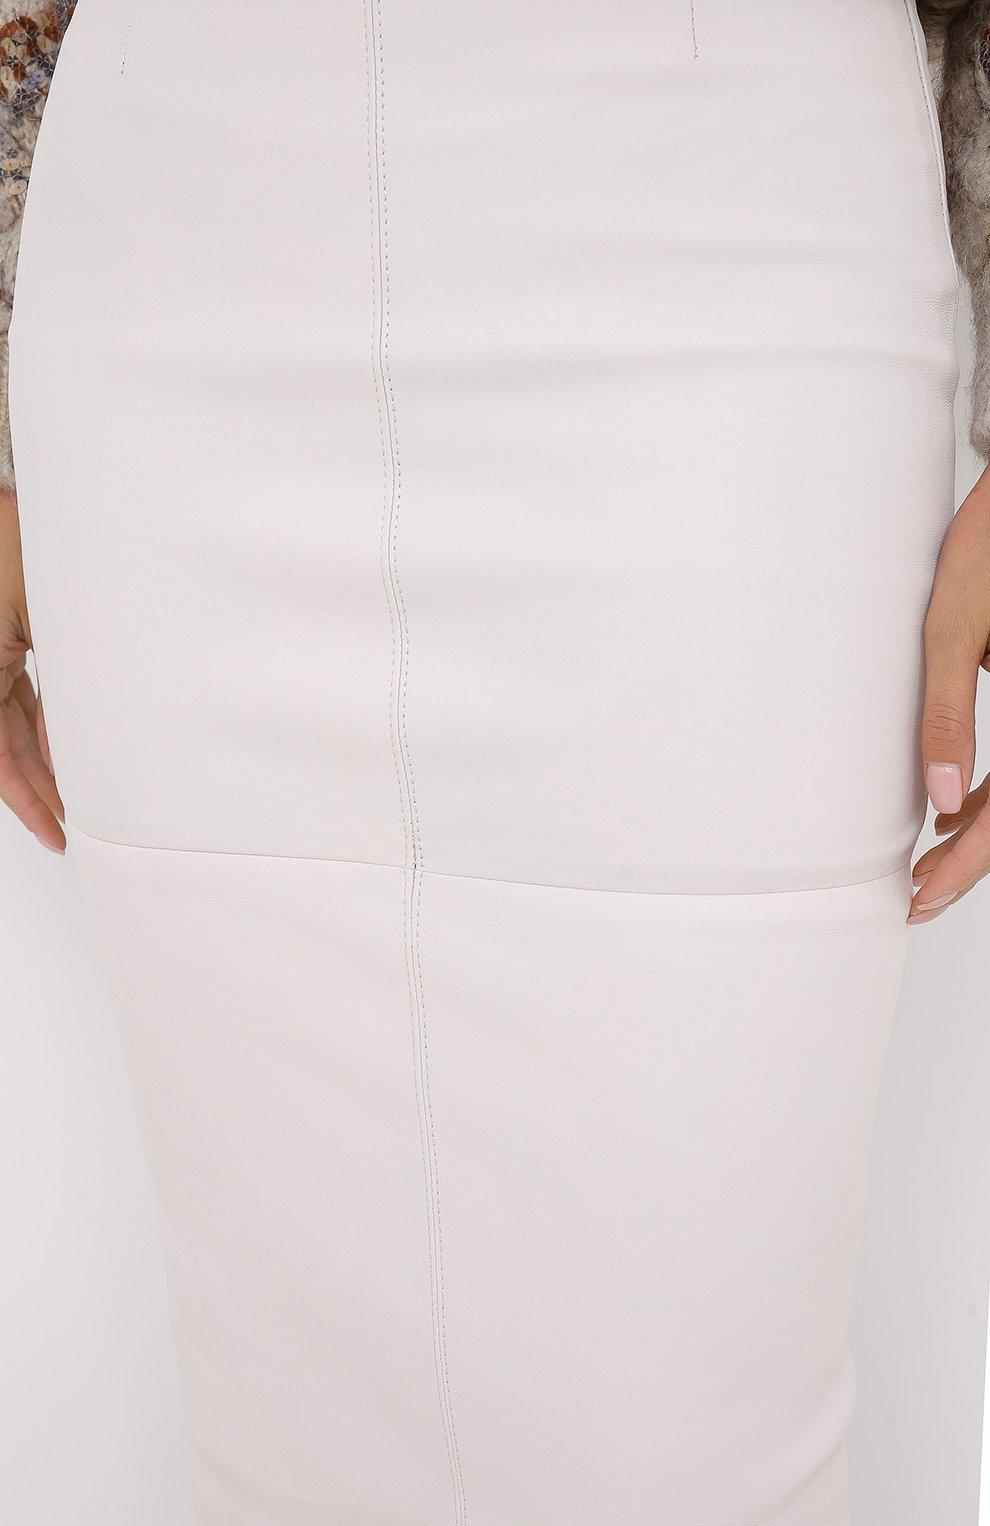 Женская кожаная юбка BRUNELLO CUCINELLI бежевого цвета, арт. MPV32G2968 | Фото 5